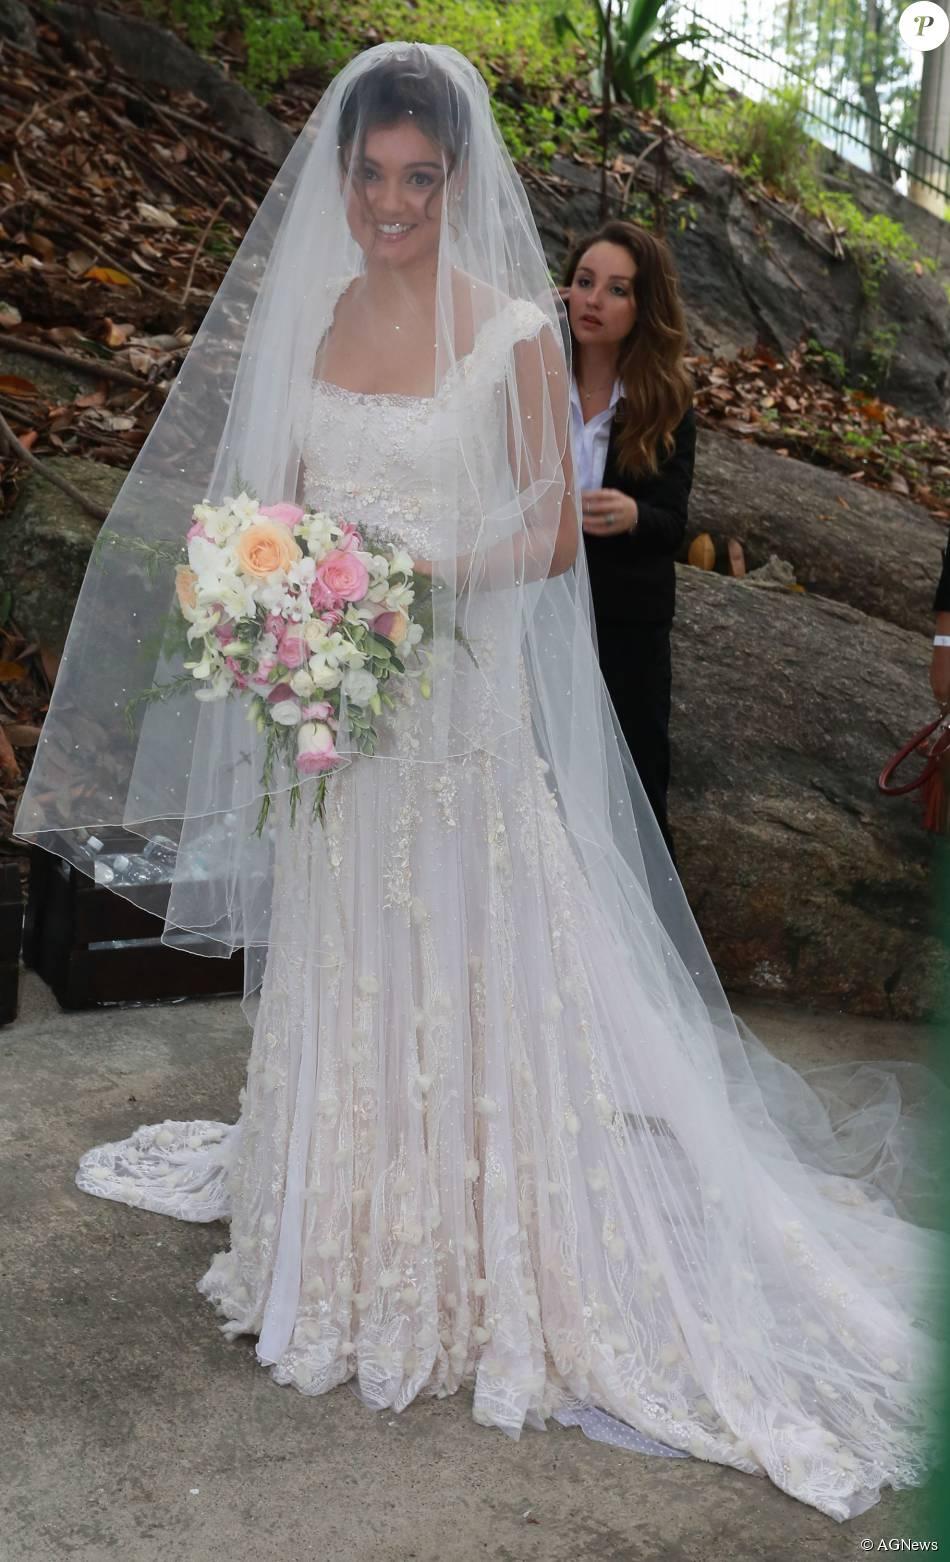 Sophie Charlotte usou vestido de noiva da grife Martu, da estilista Marta Macedo